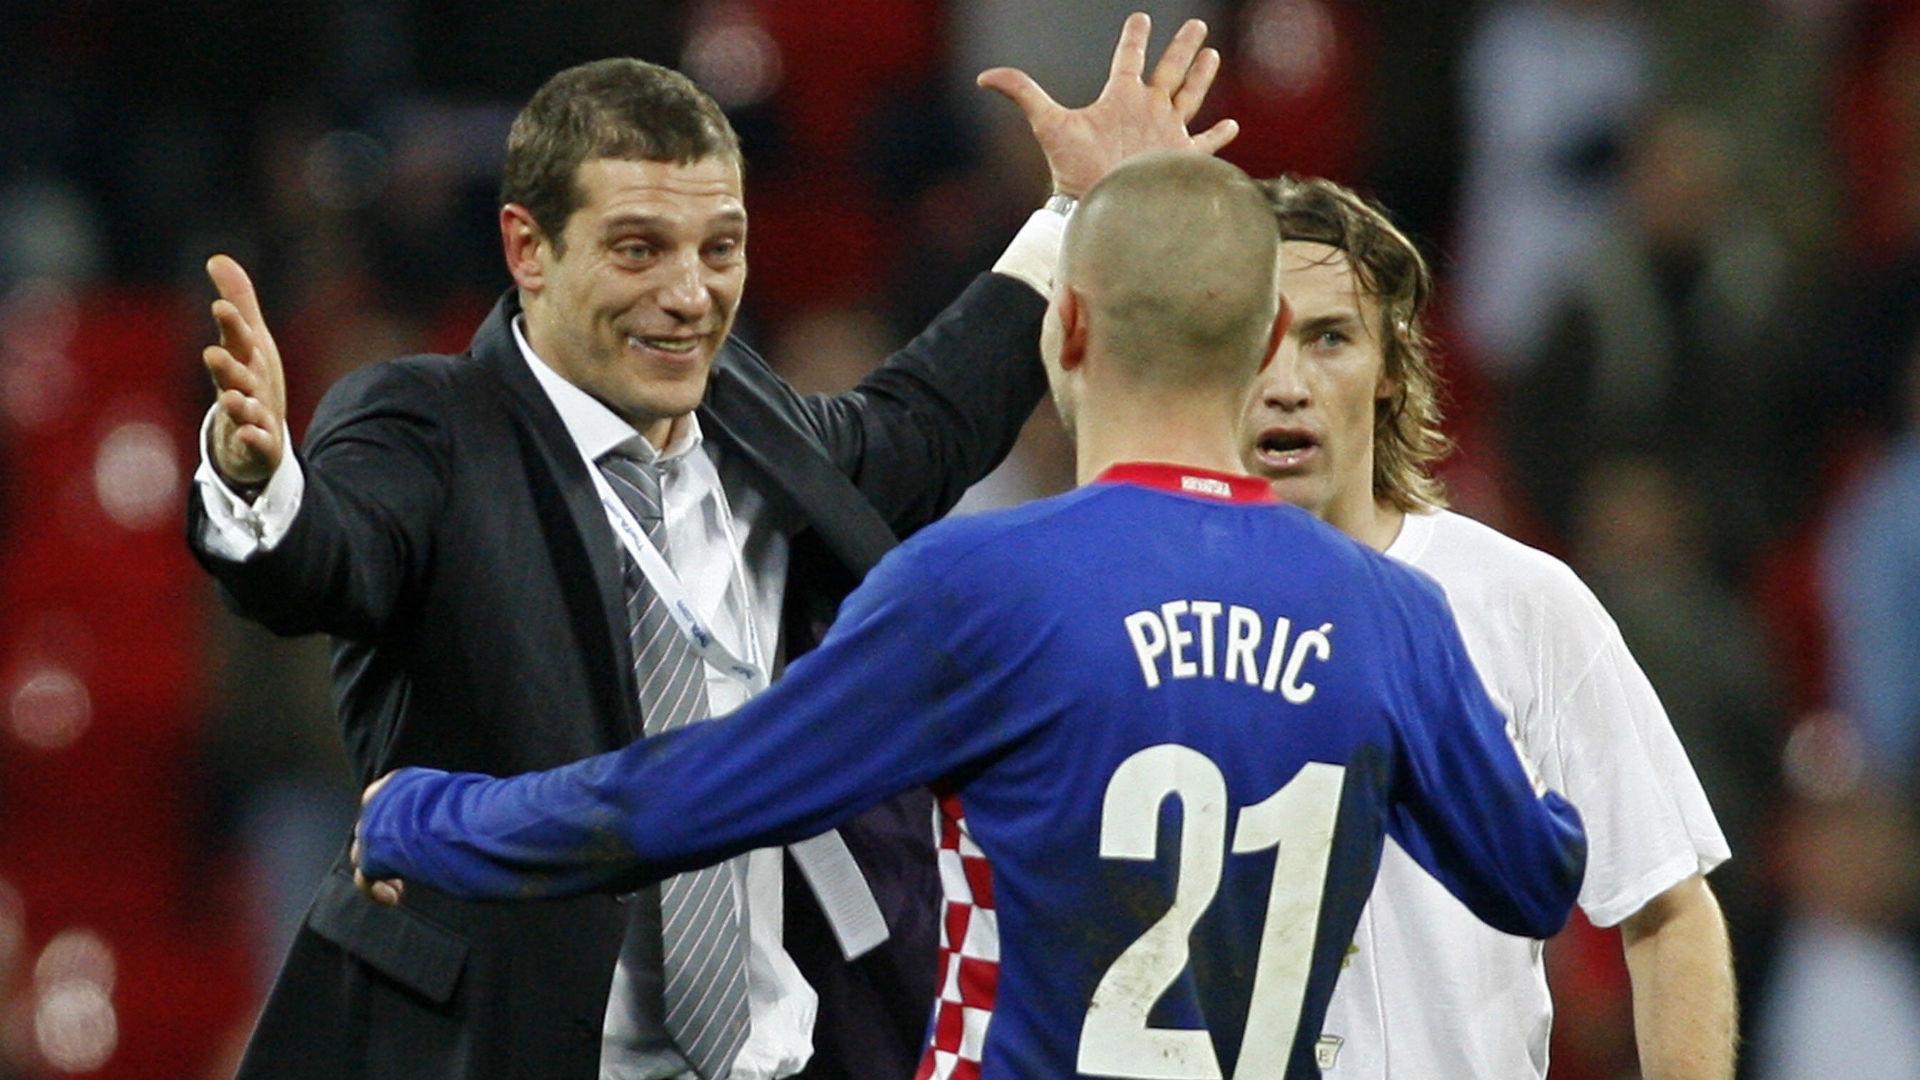 slaven bilic mladen petric - england croatia - euro 2008 qualifier - 21112007